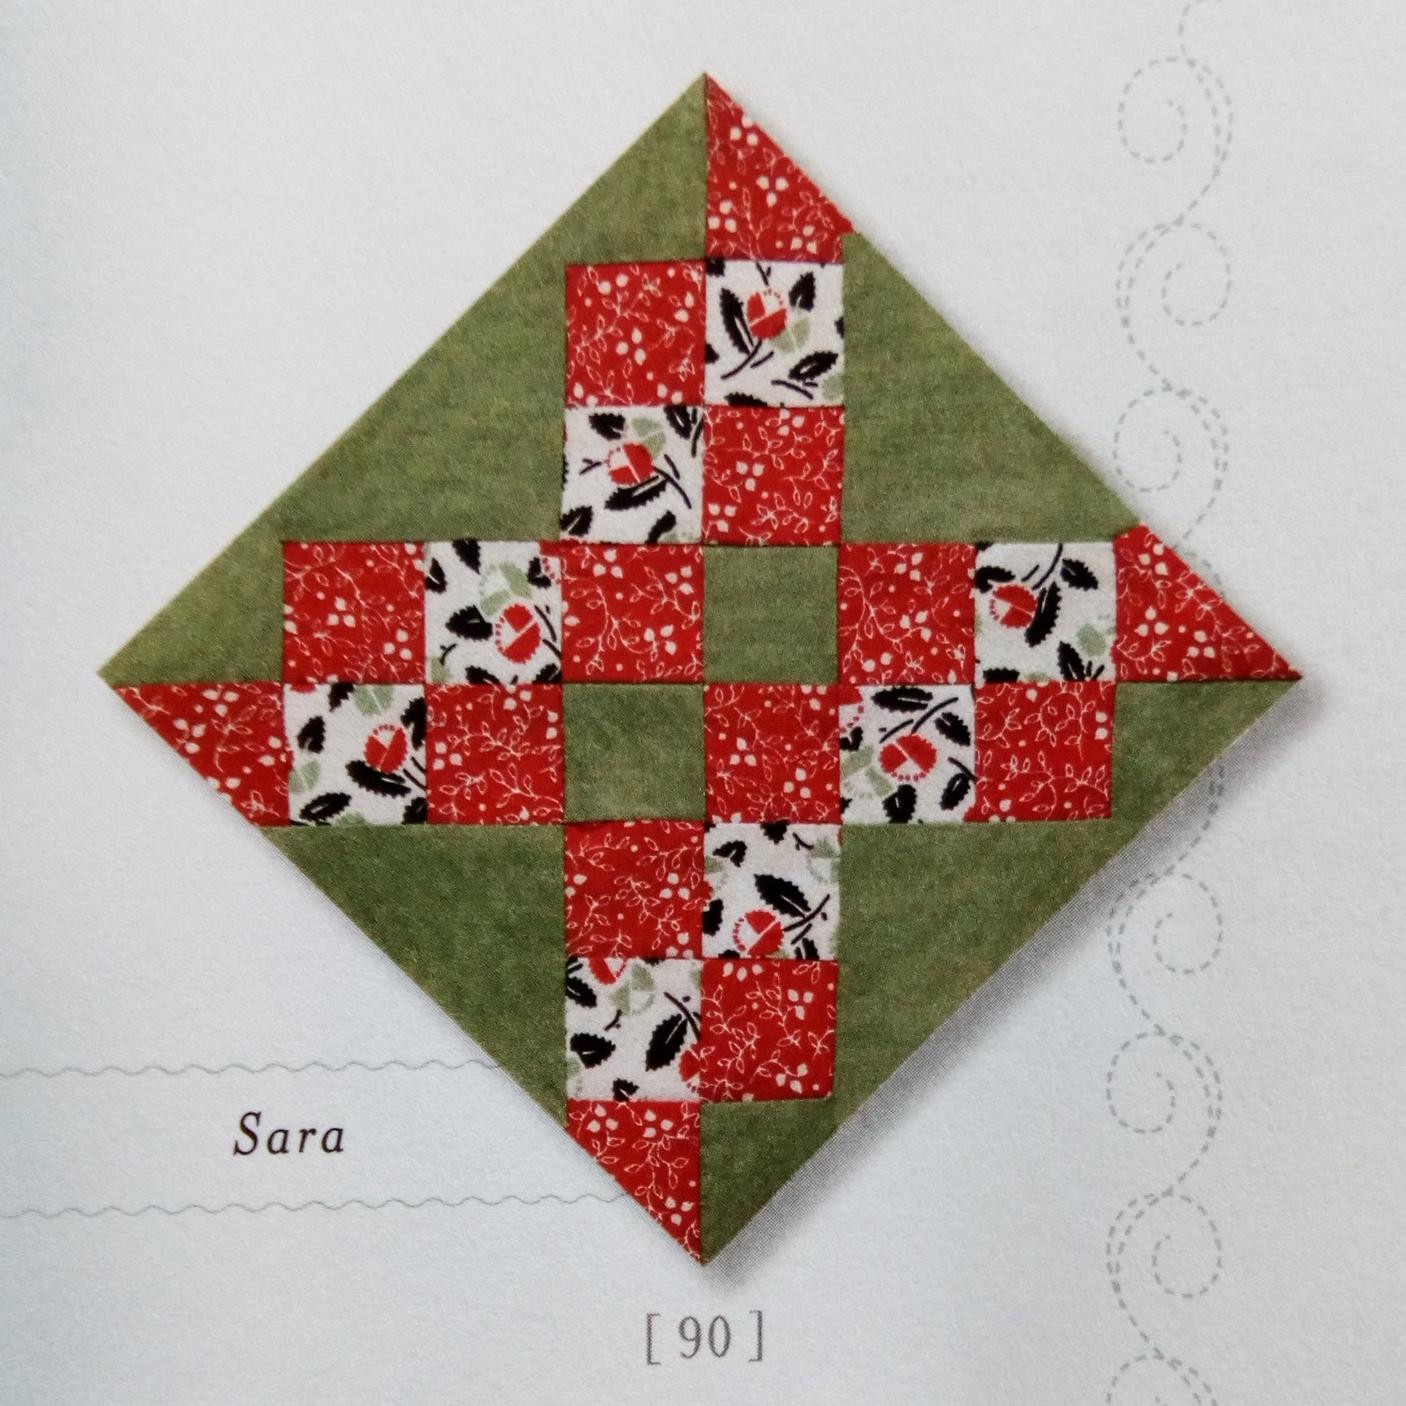 Sara: Coming September 10